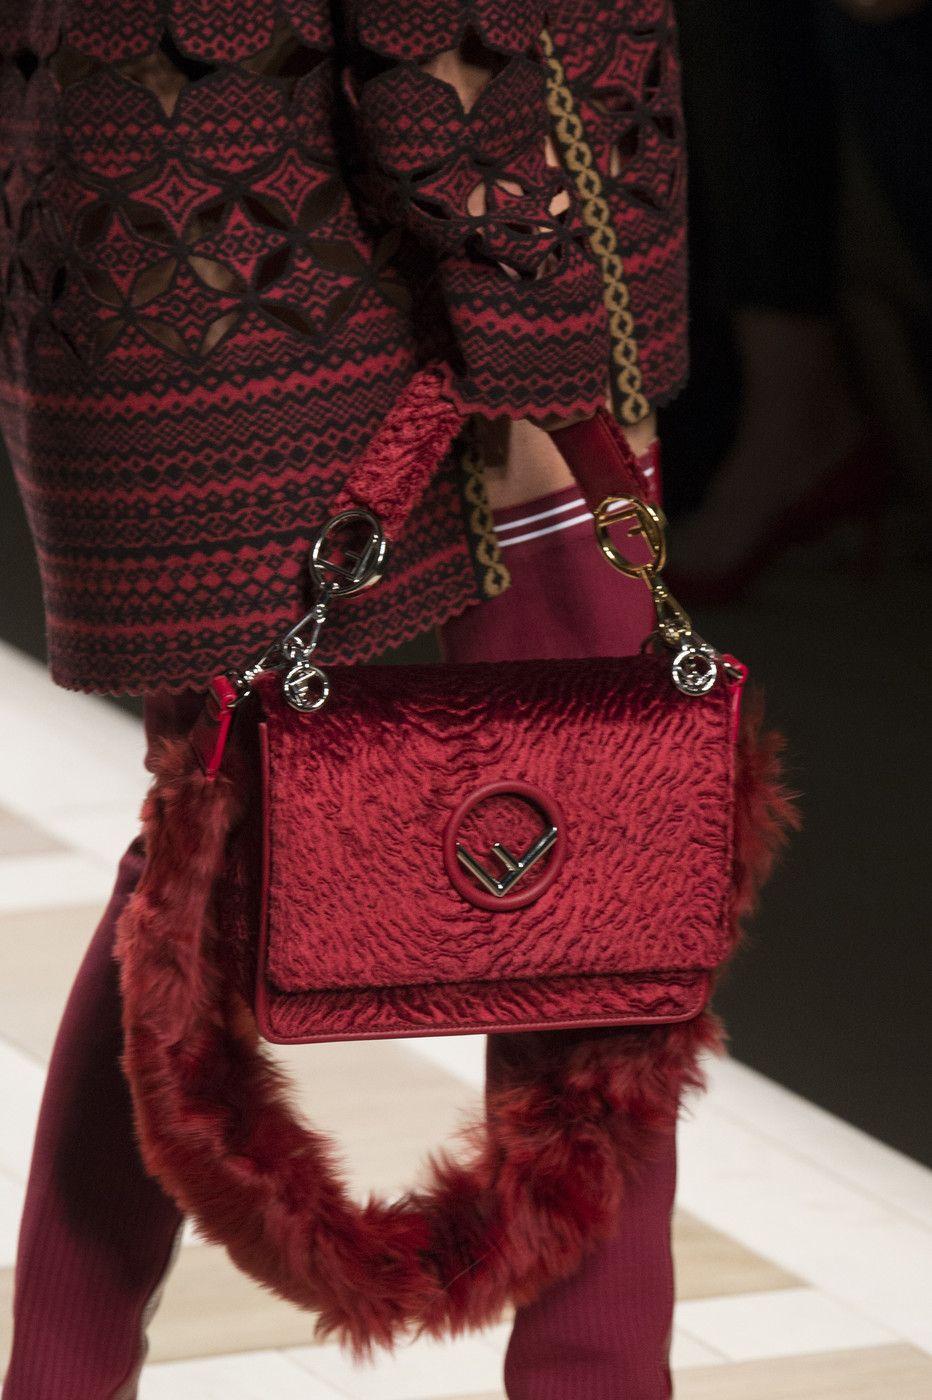 Fendi at Milan Fashion Week Fall 2017   Bags    Clutches    Handbags ... 70ff15aae6f